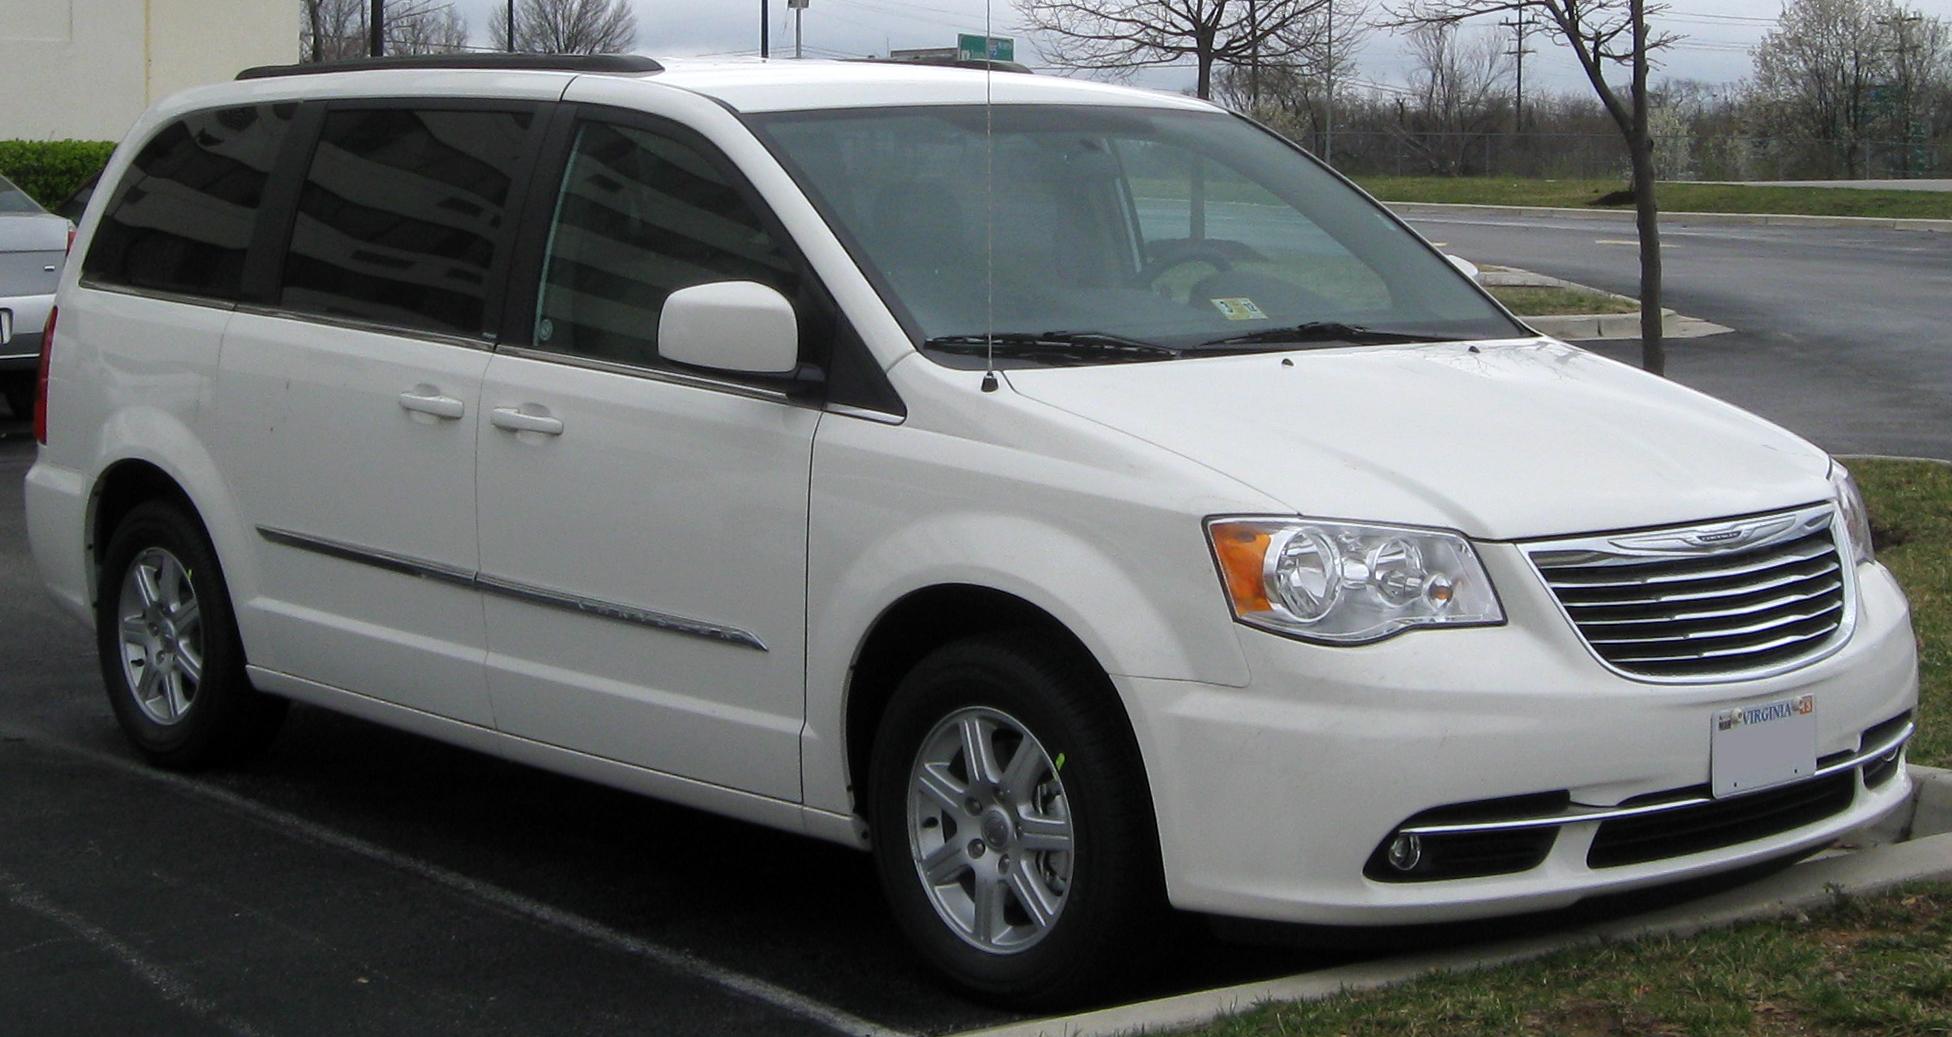 Chrysler Voyager V Restyling 2011 - 2015 Minivan #4